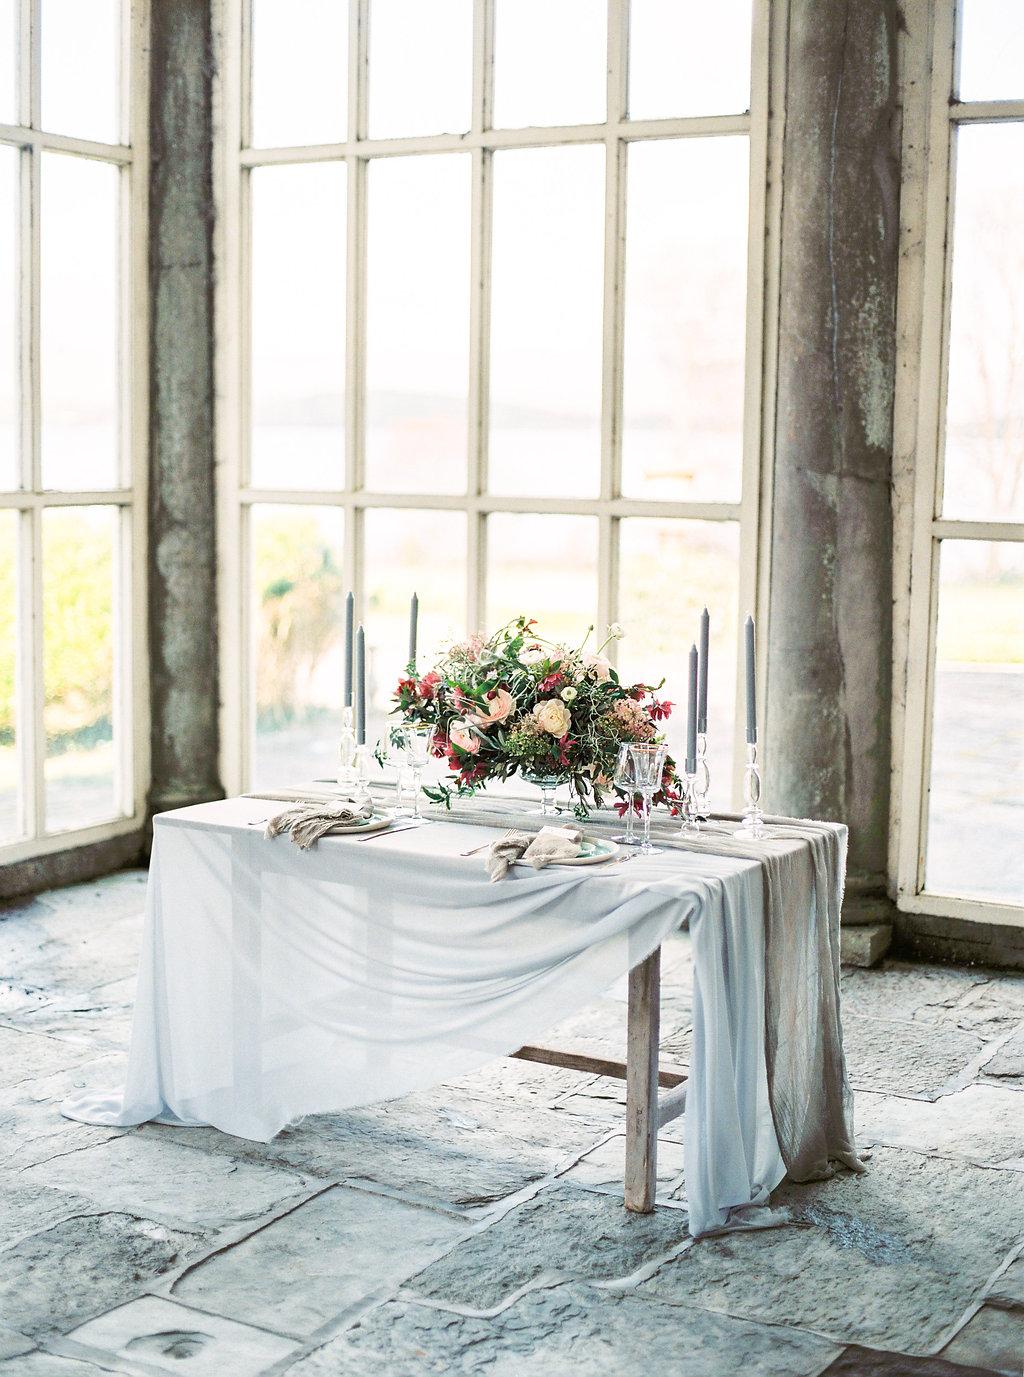 WeddingSparrow-PhotographybyIntoTheLight-Macias-lordan.com-ONLINESHARING(1of50).jpg